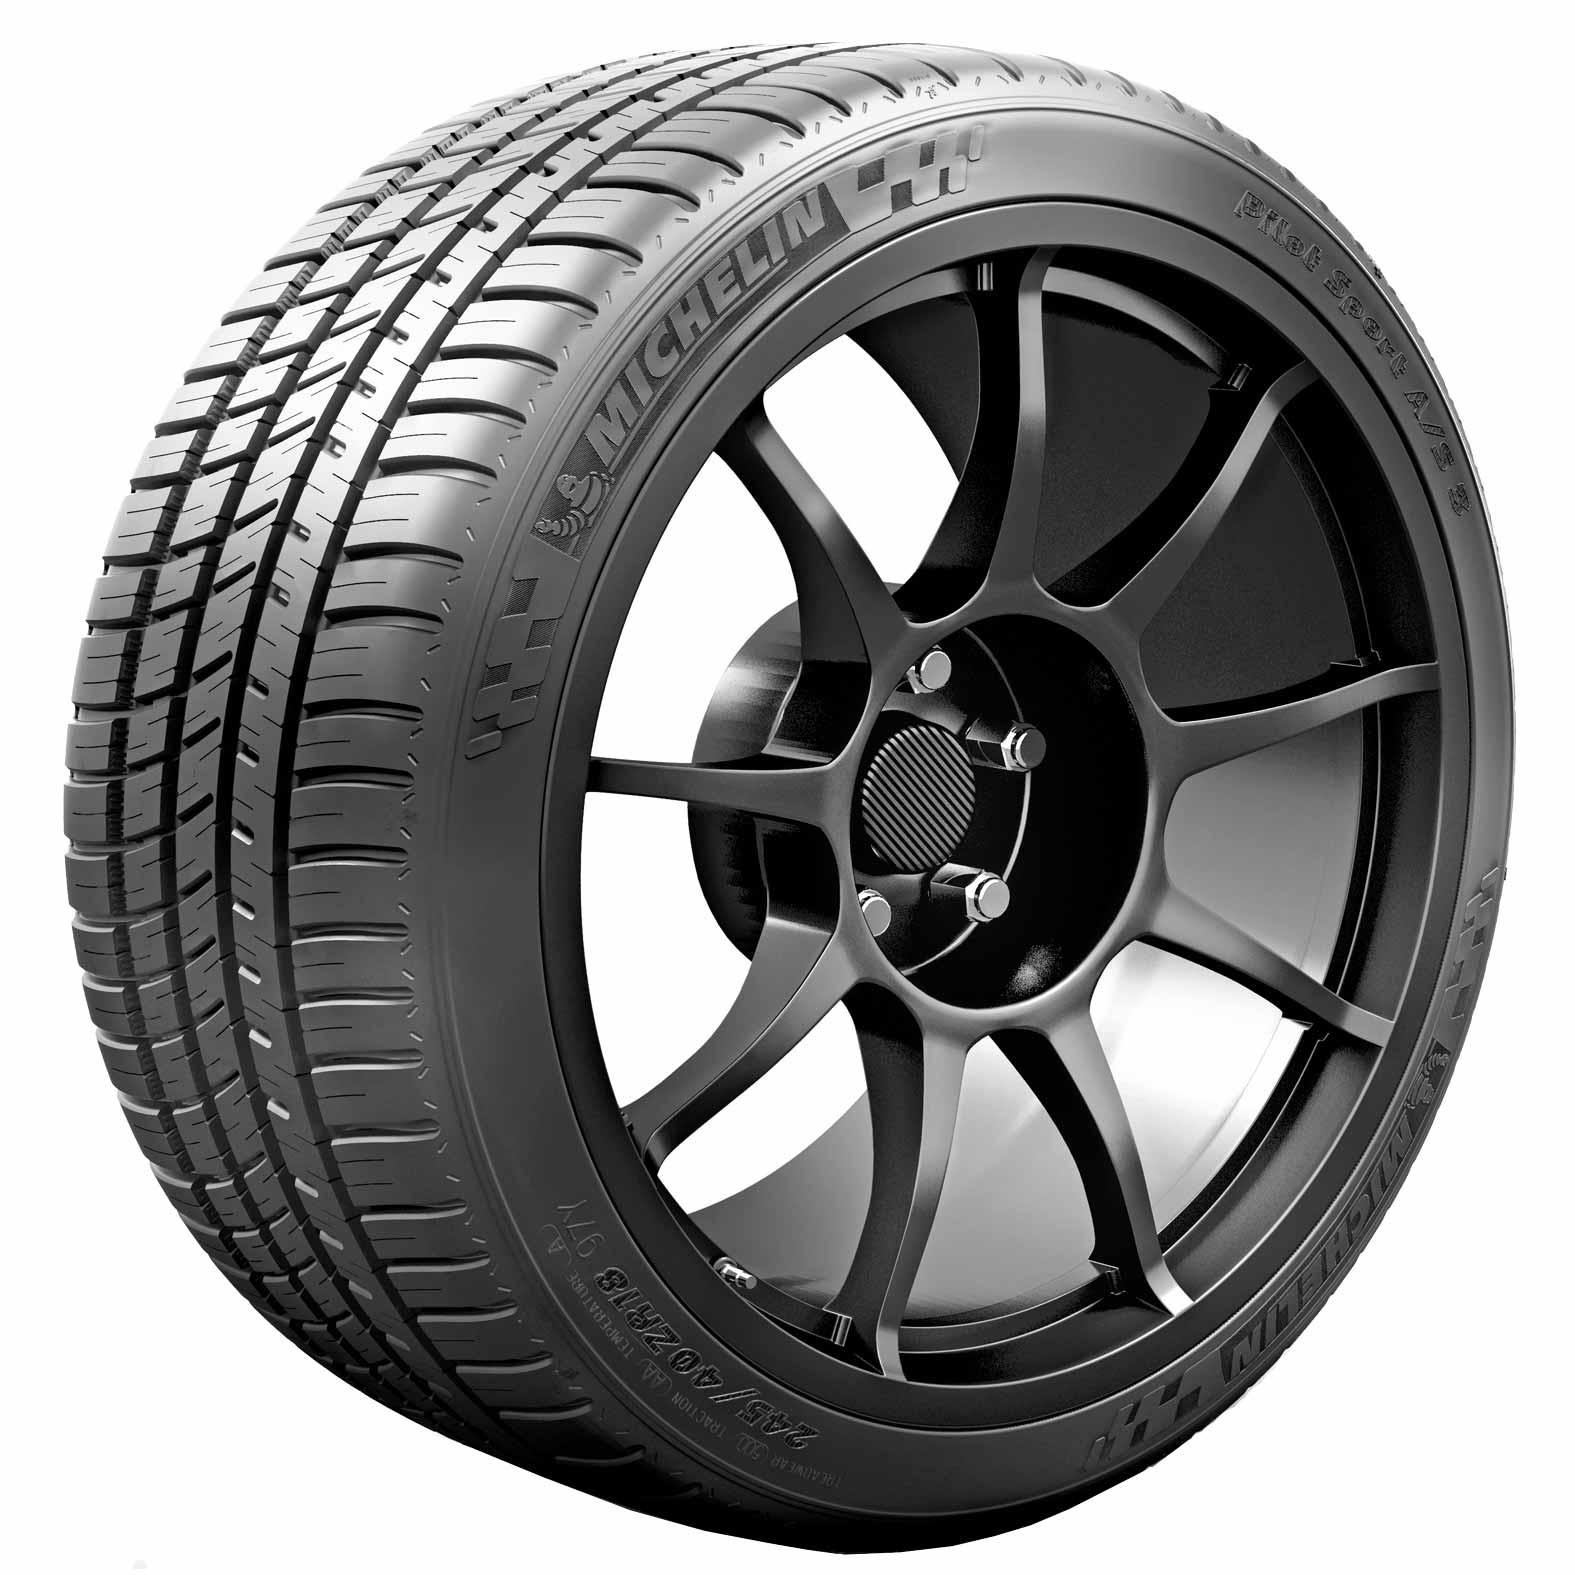 Michelin Pilot Sport A S 3 >> Michelin PILOT SPORT A/S 3 tires